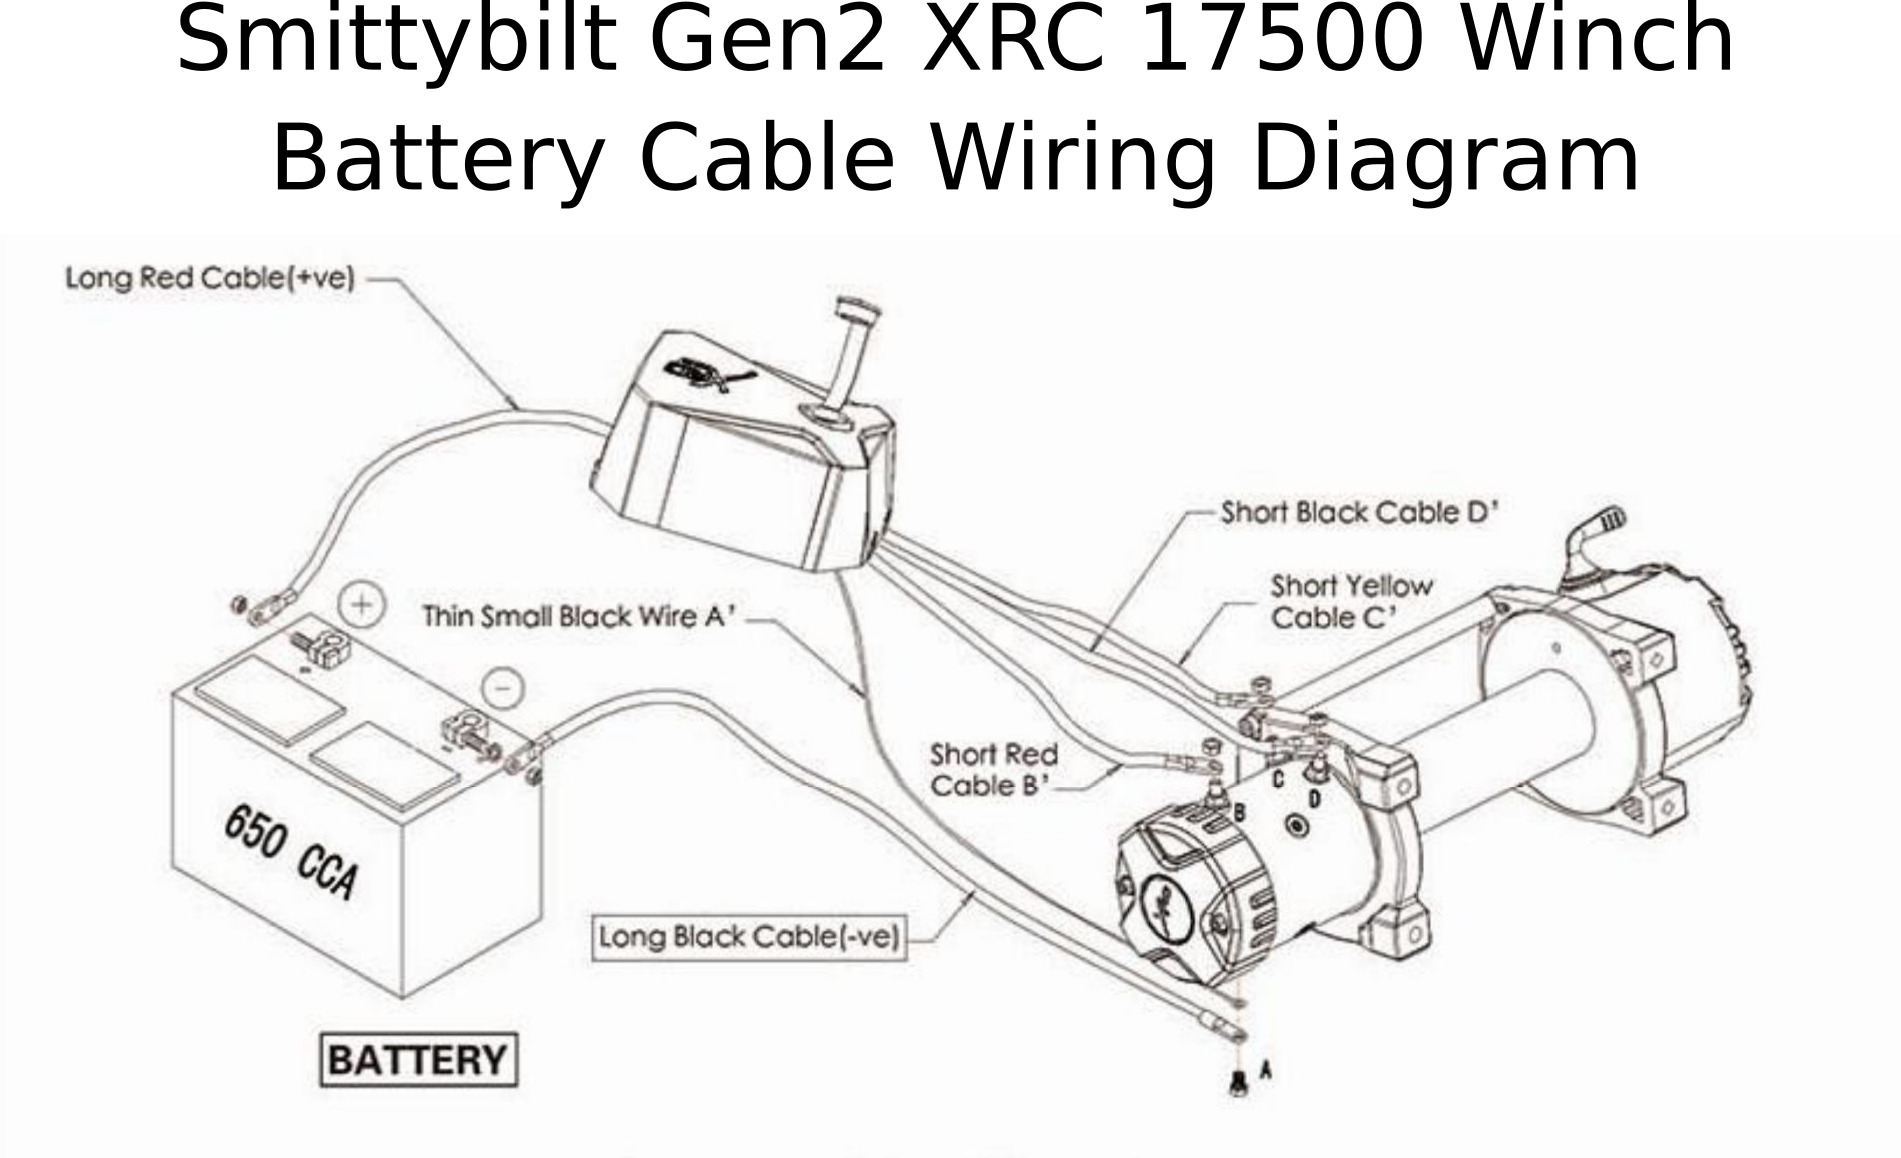 [Complete Specs] Smittybilt Gen2 XRC 17500 Winch 97417